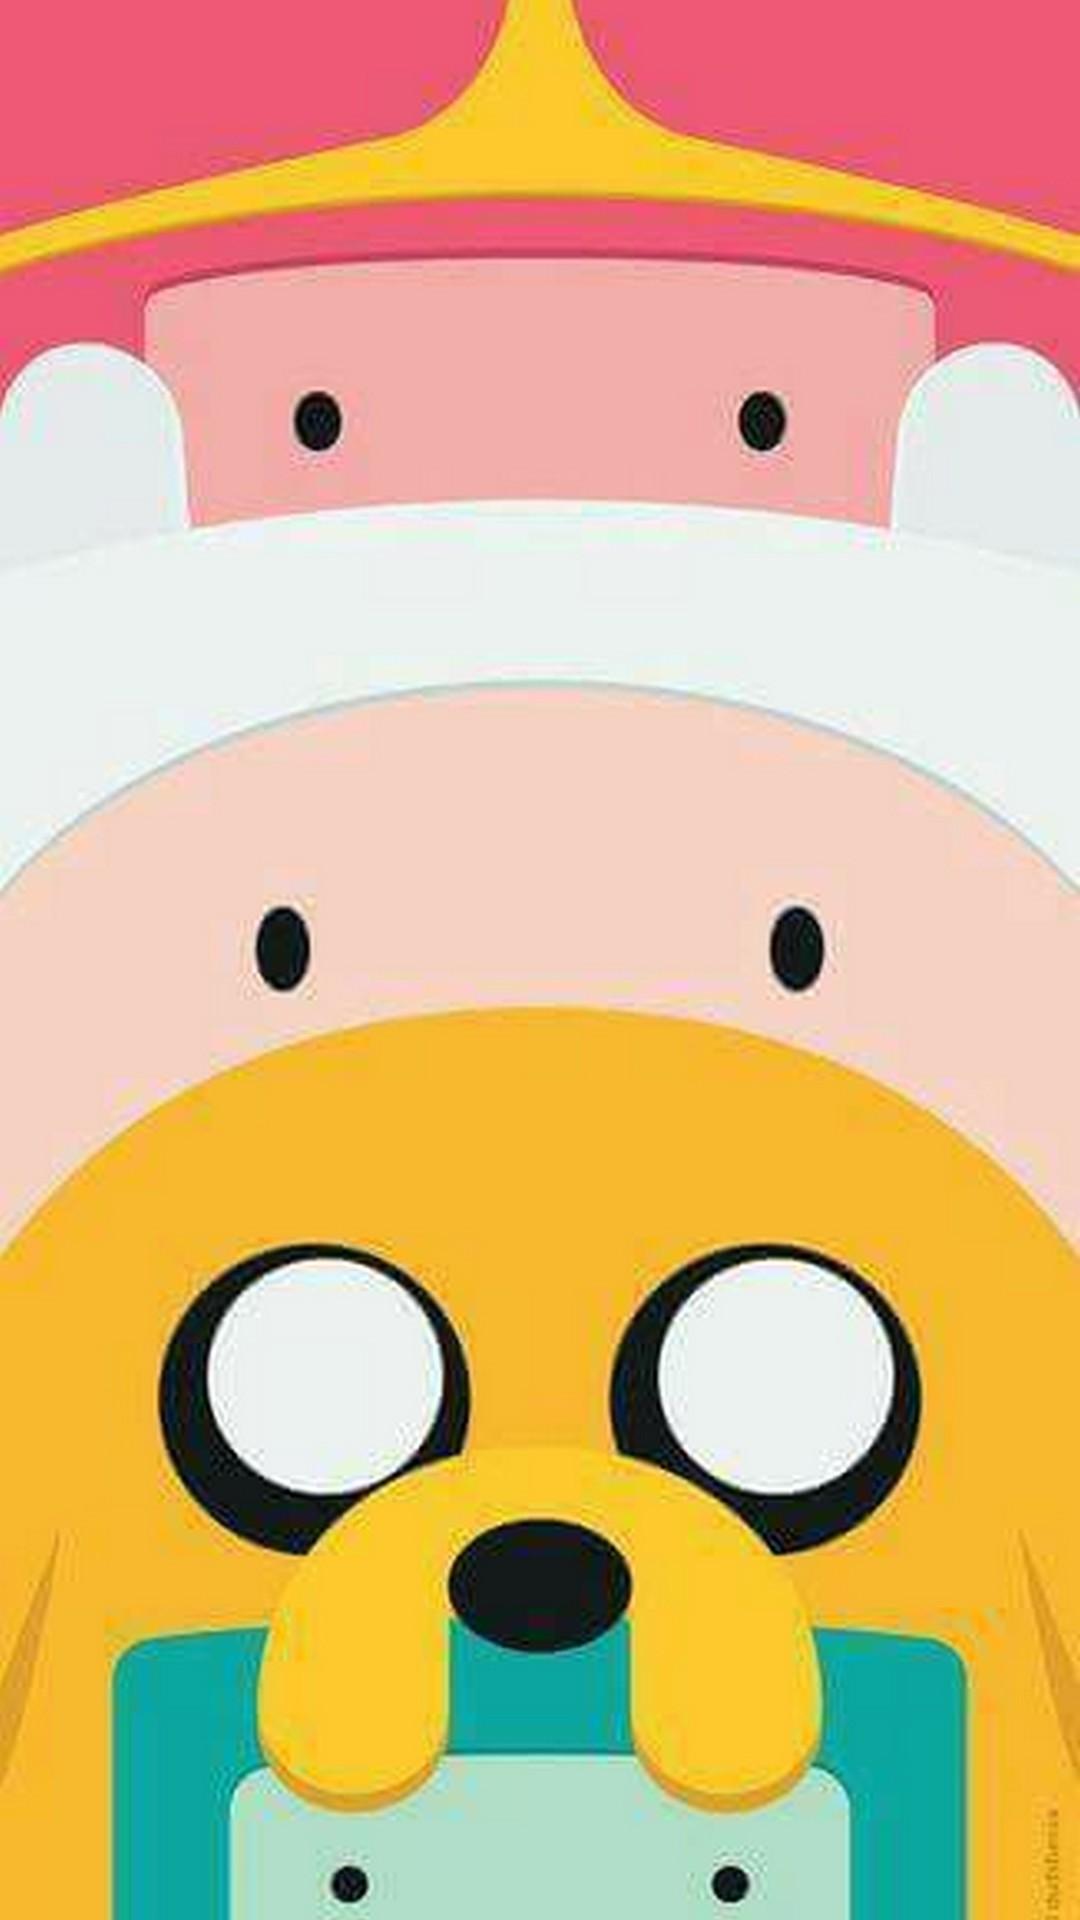 Wallpaper Adventure Time Cartoon Network Iphone With - Finn And Jake Wallpaper Hd , HD Wallpaper & Backgrounds